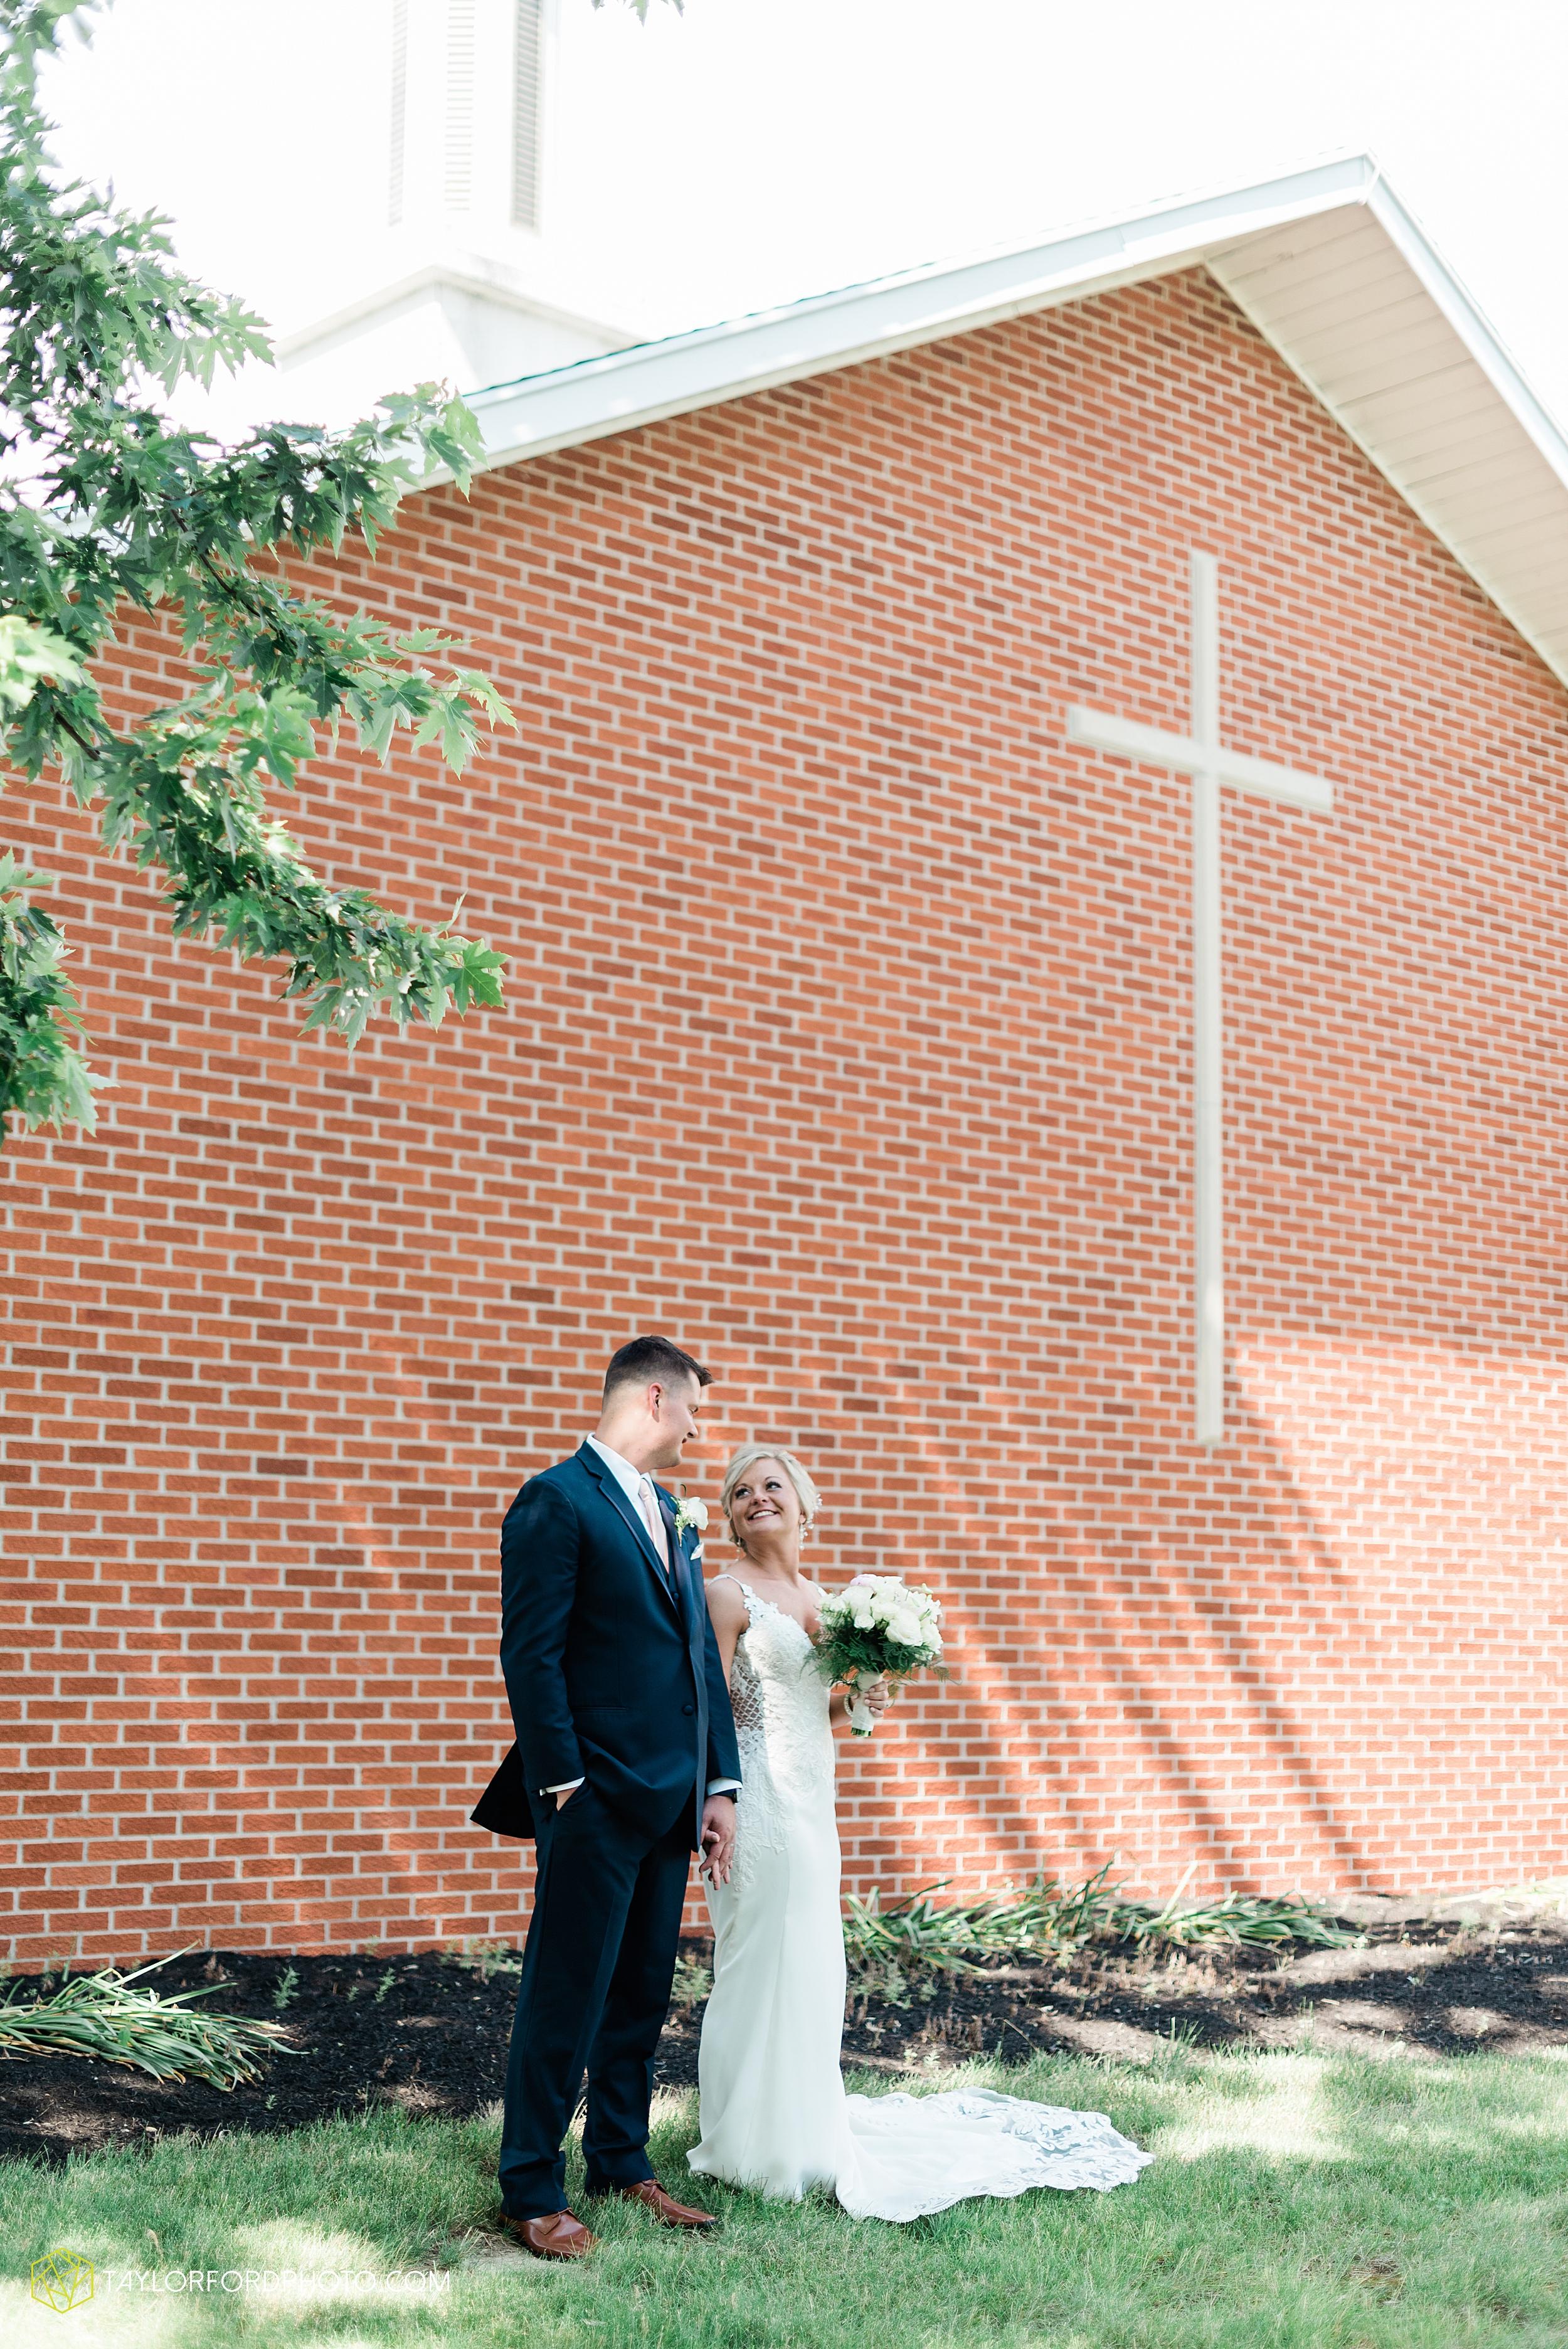 carly-trent-lima-elida-ohio-wedding-the-met-civic-center-reception-immanuel-united-methodist-church-photography-taylor-ford-hirschy-photographer_3353.jpg